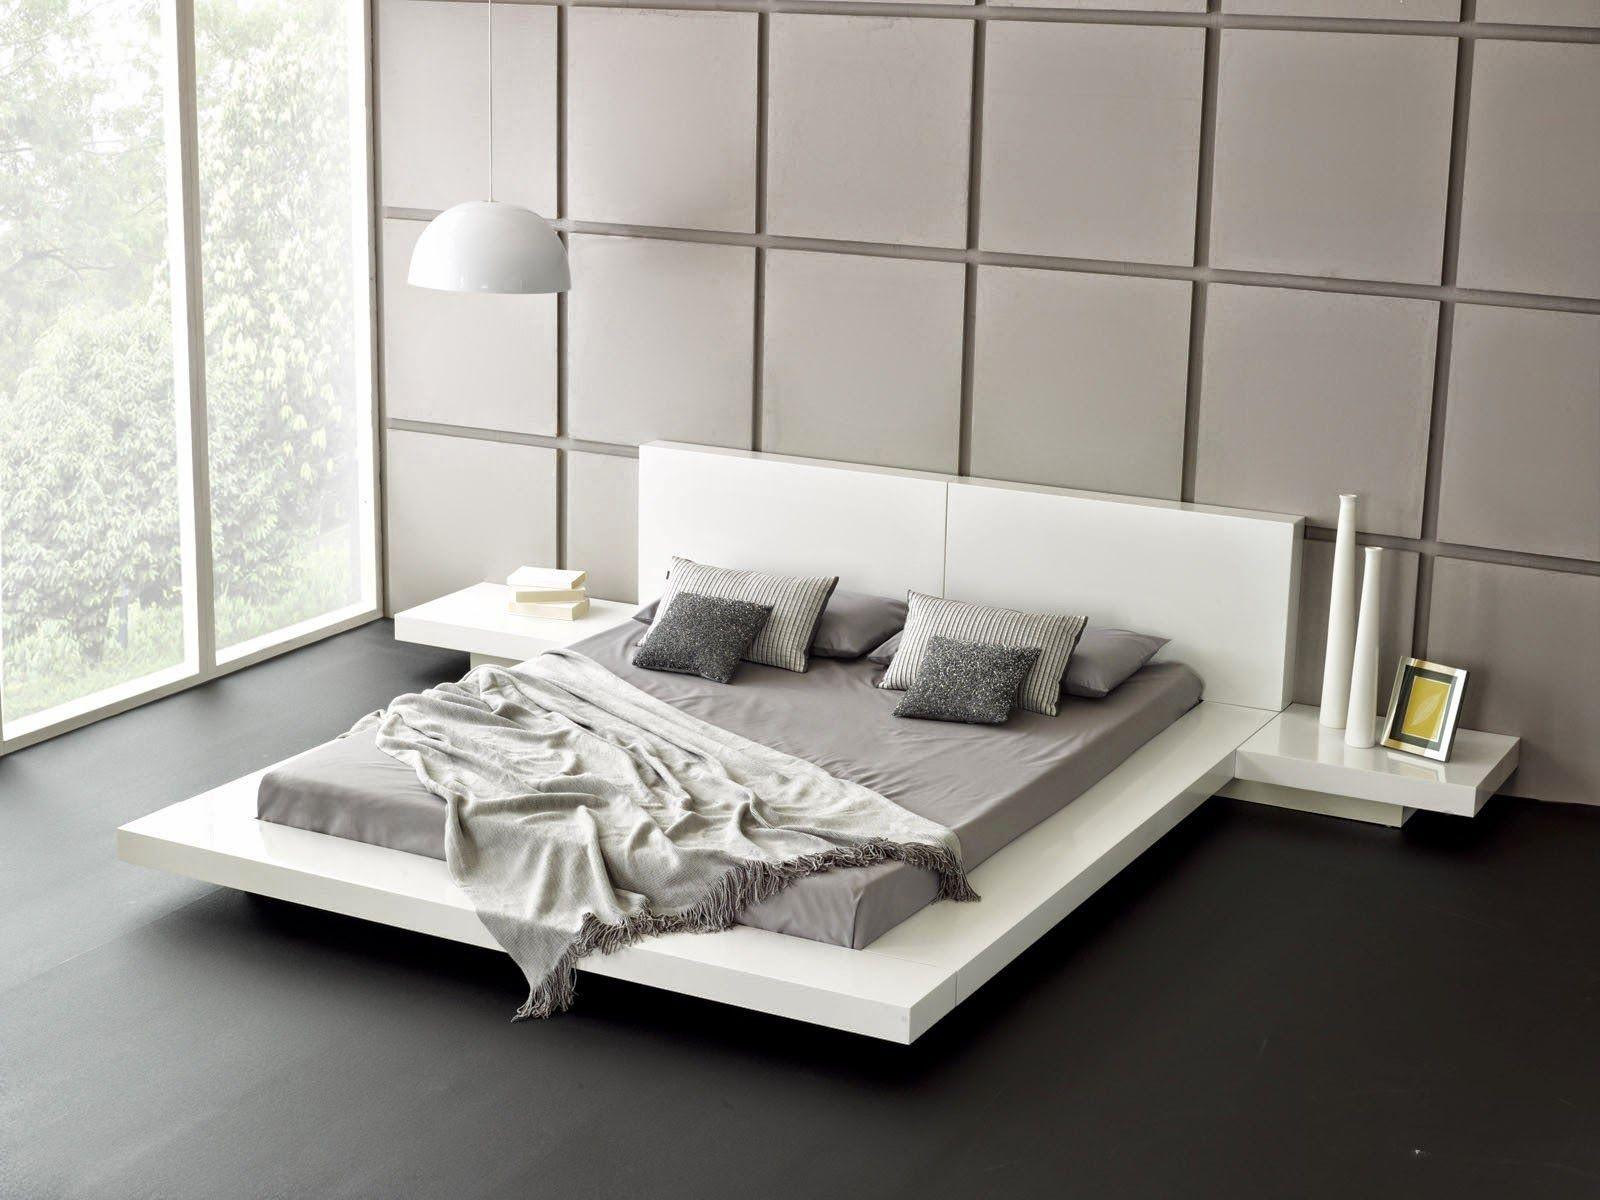 Minimalist House, Minimalist House Design, House Design, Minimalist House Models,